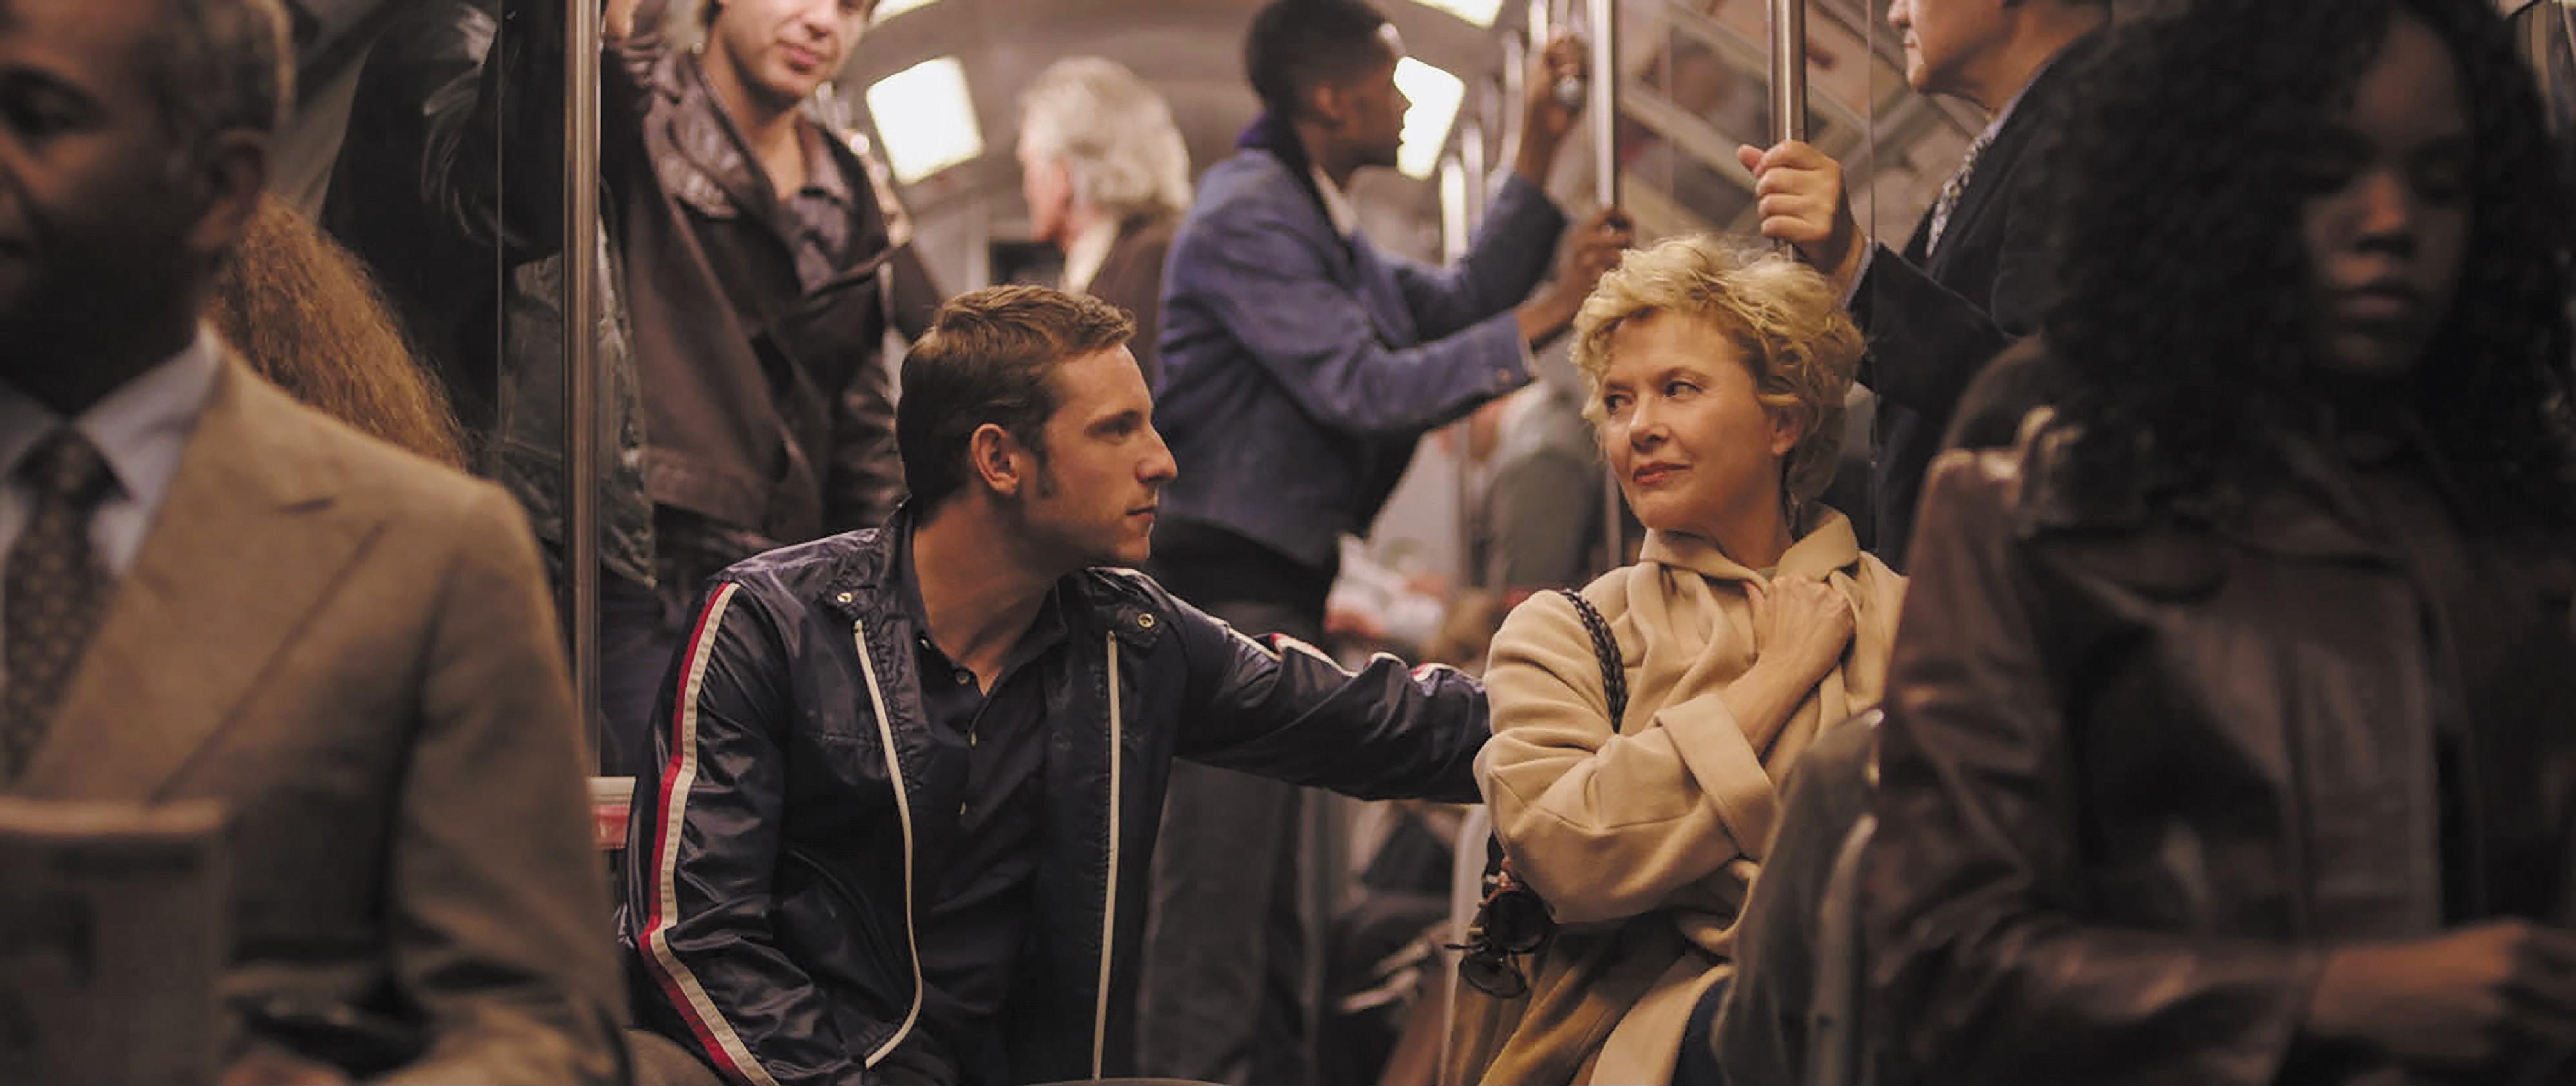 Film stars photos 93